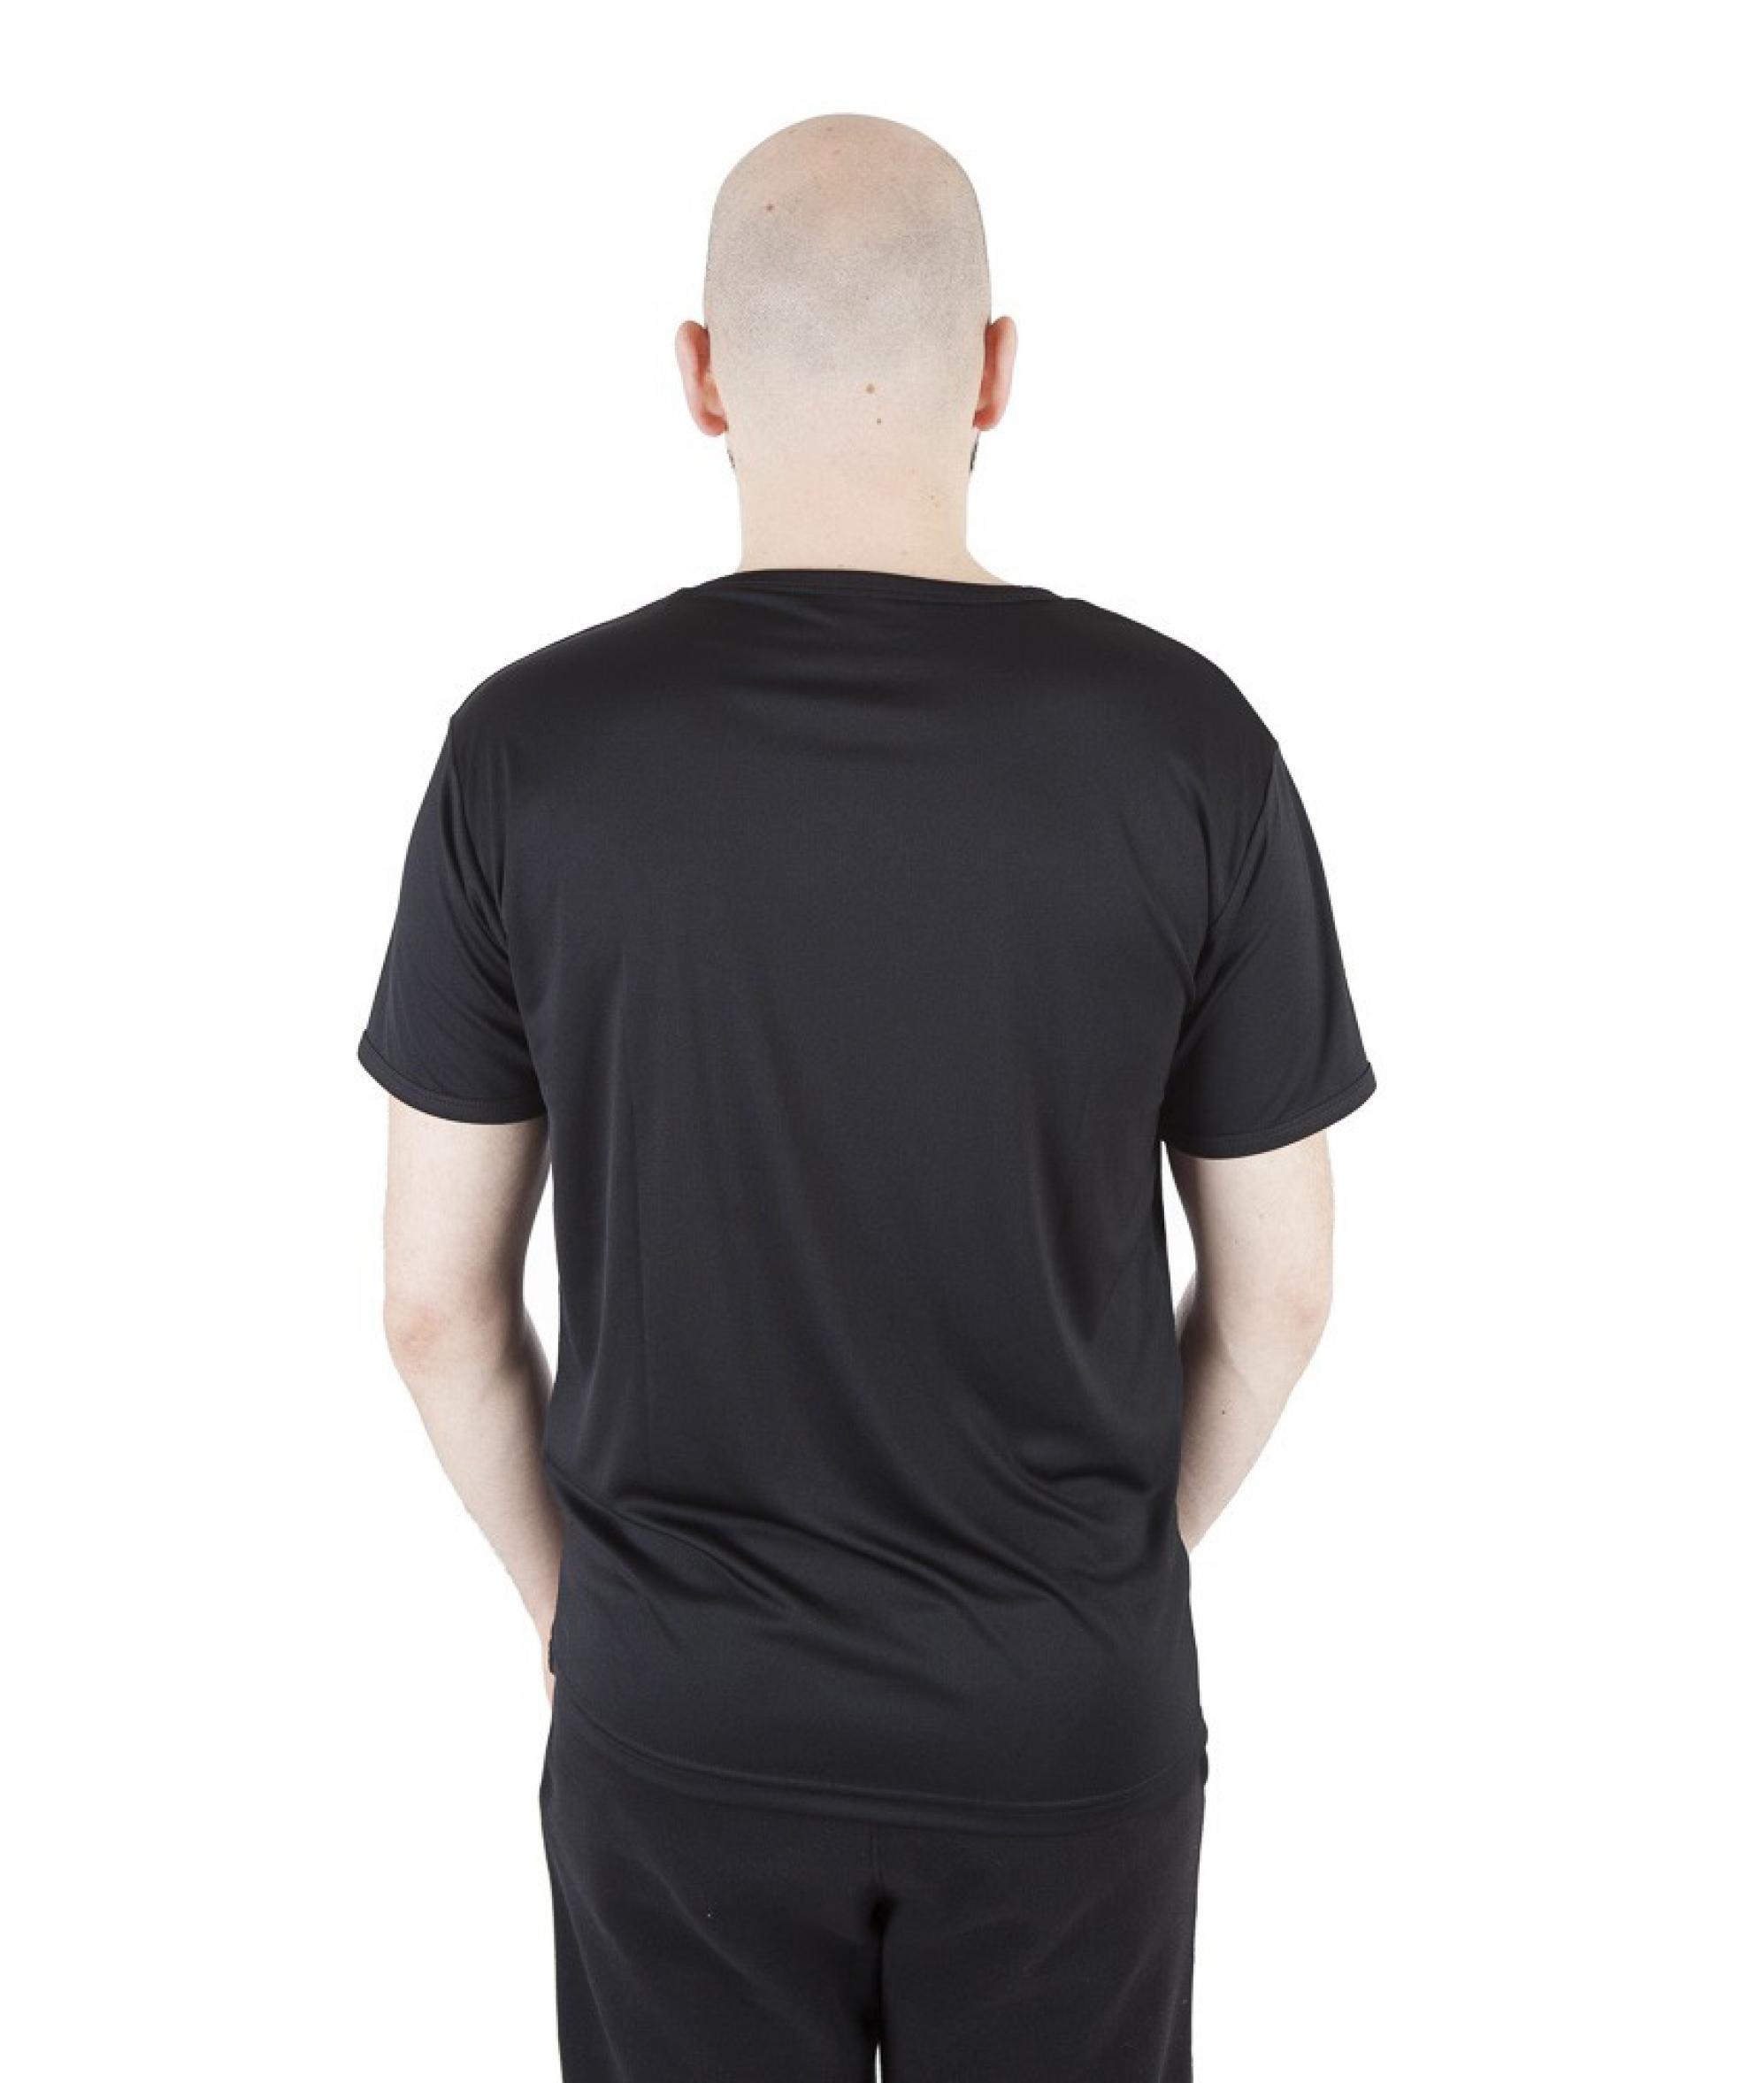 Black t shirt image - Product Details